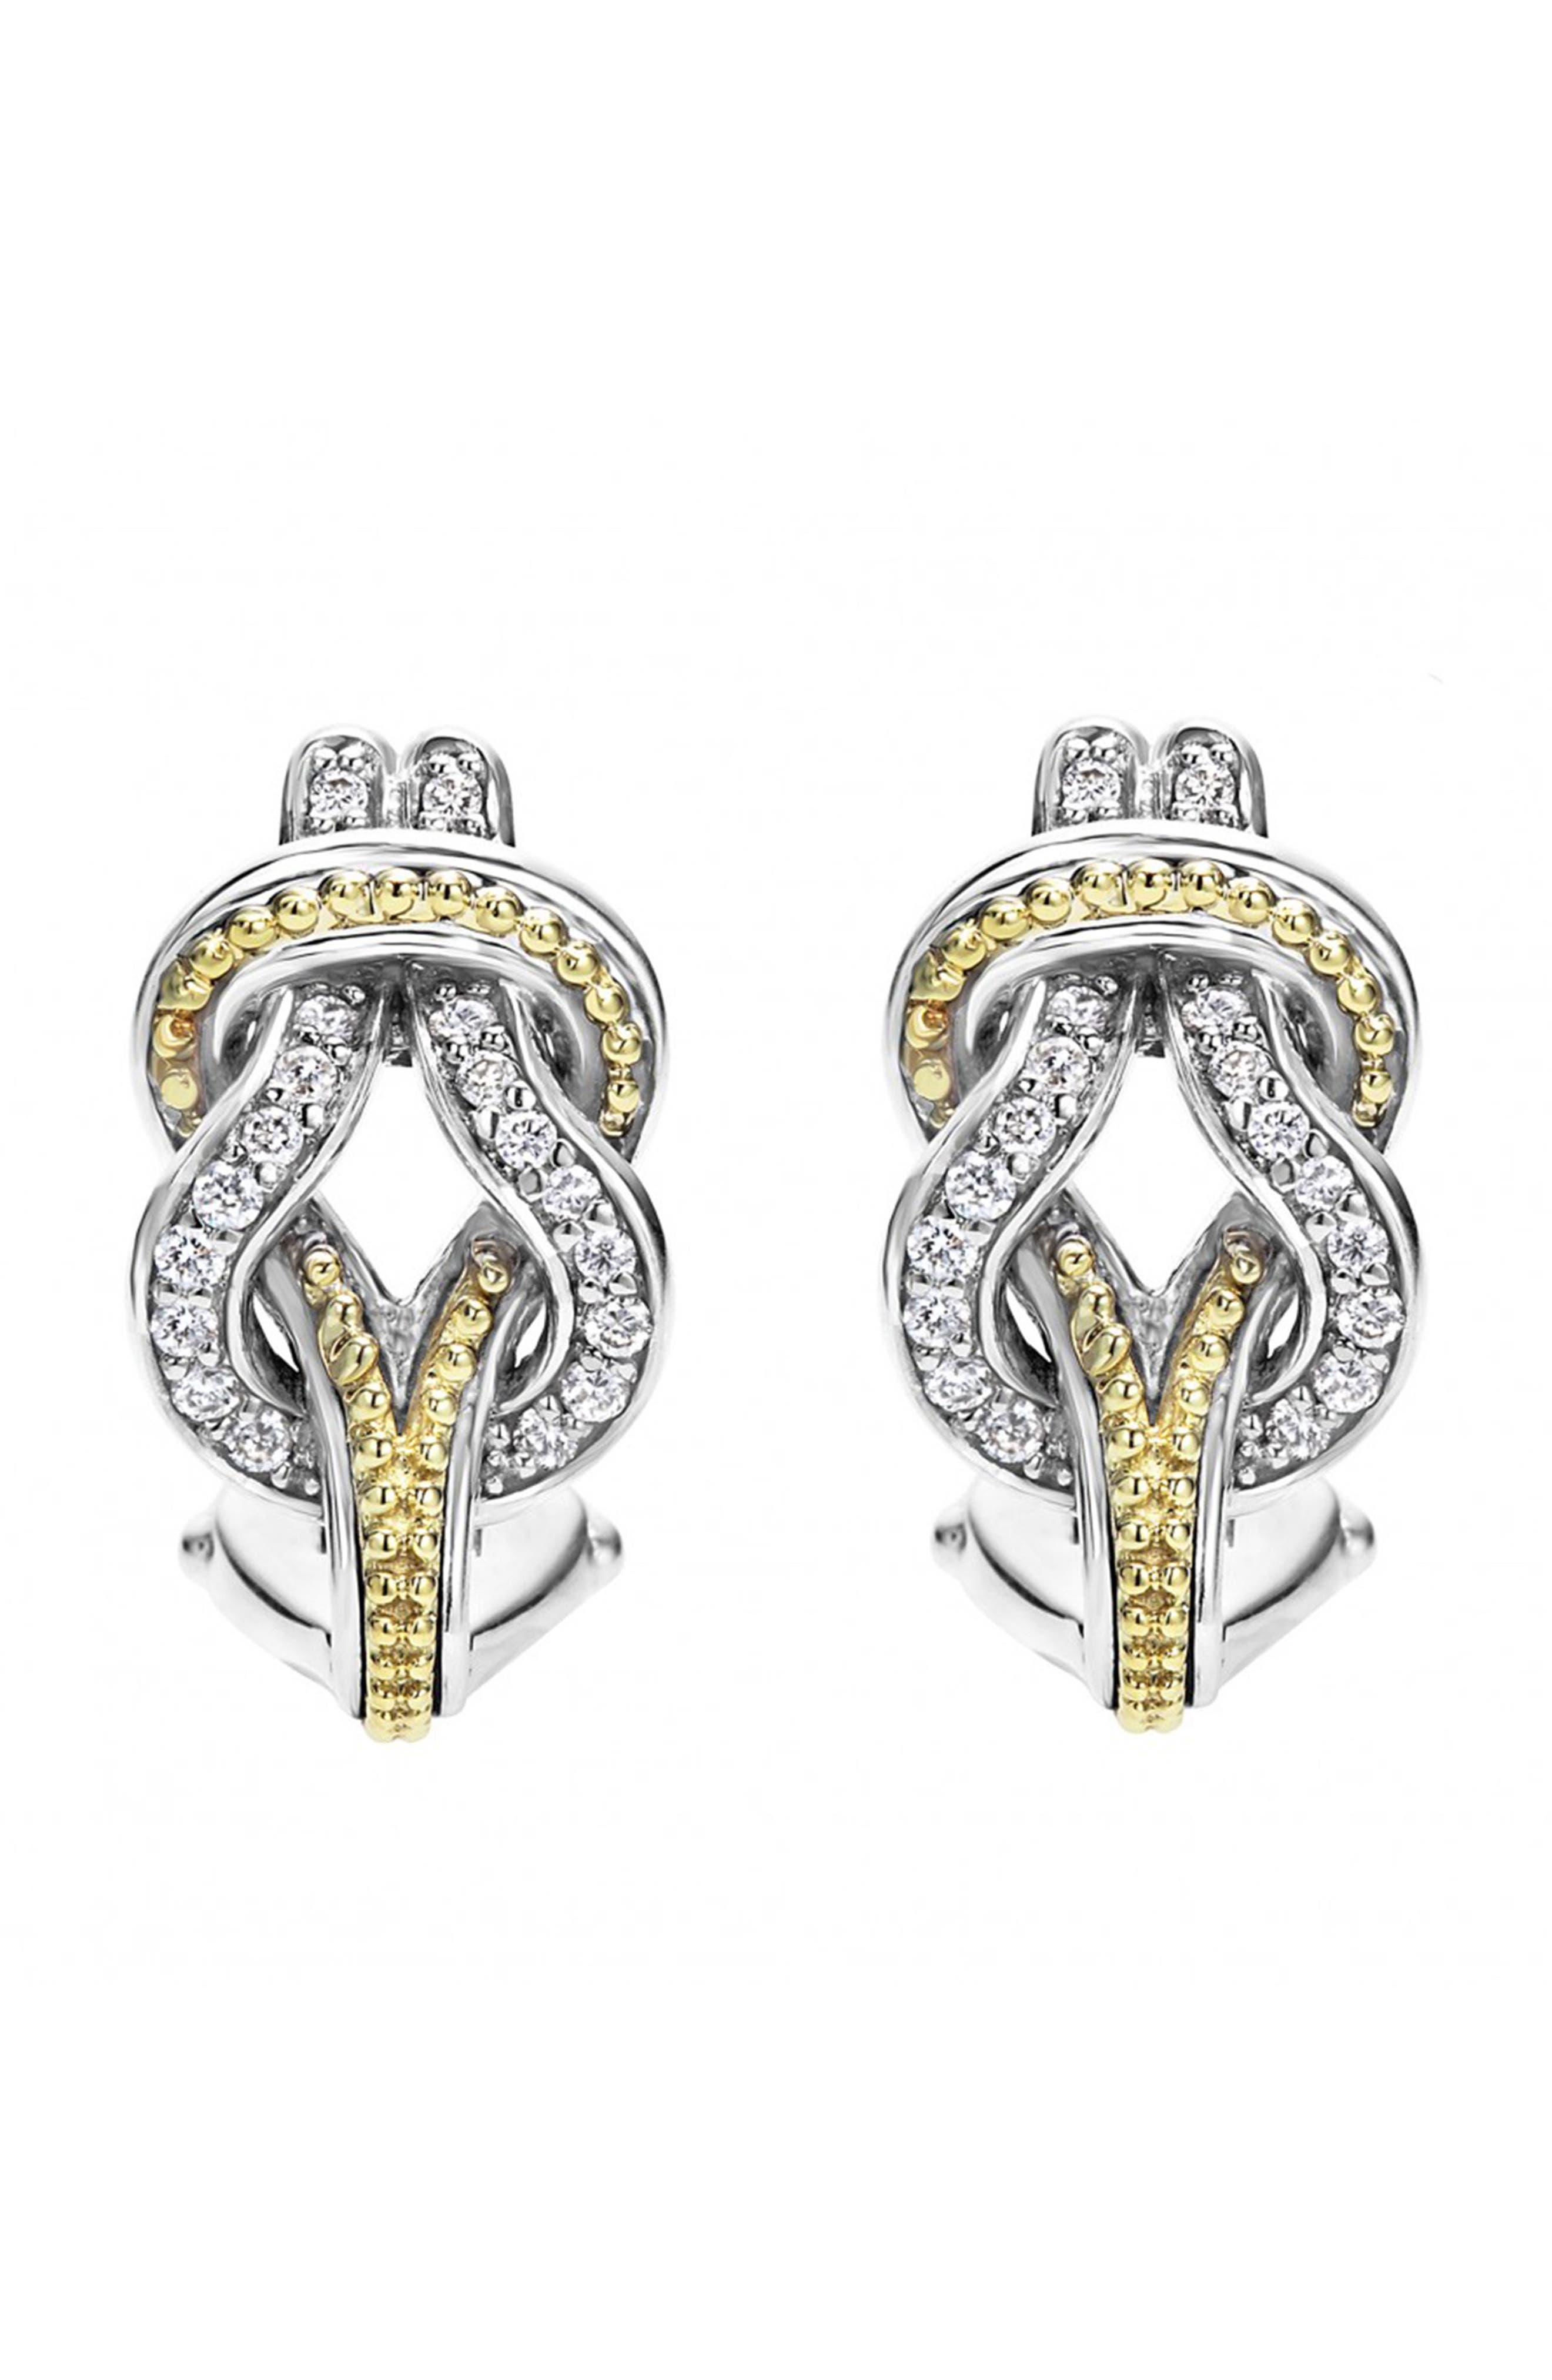 'Newport' Diamond Knot Earrings,                             Main thumbnail 1, color,                             SILVER/ GOLD